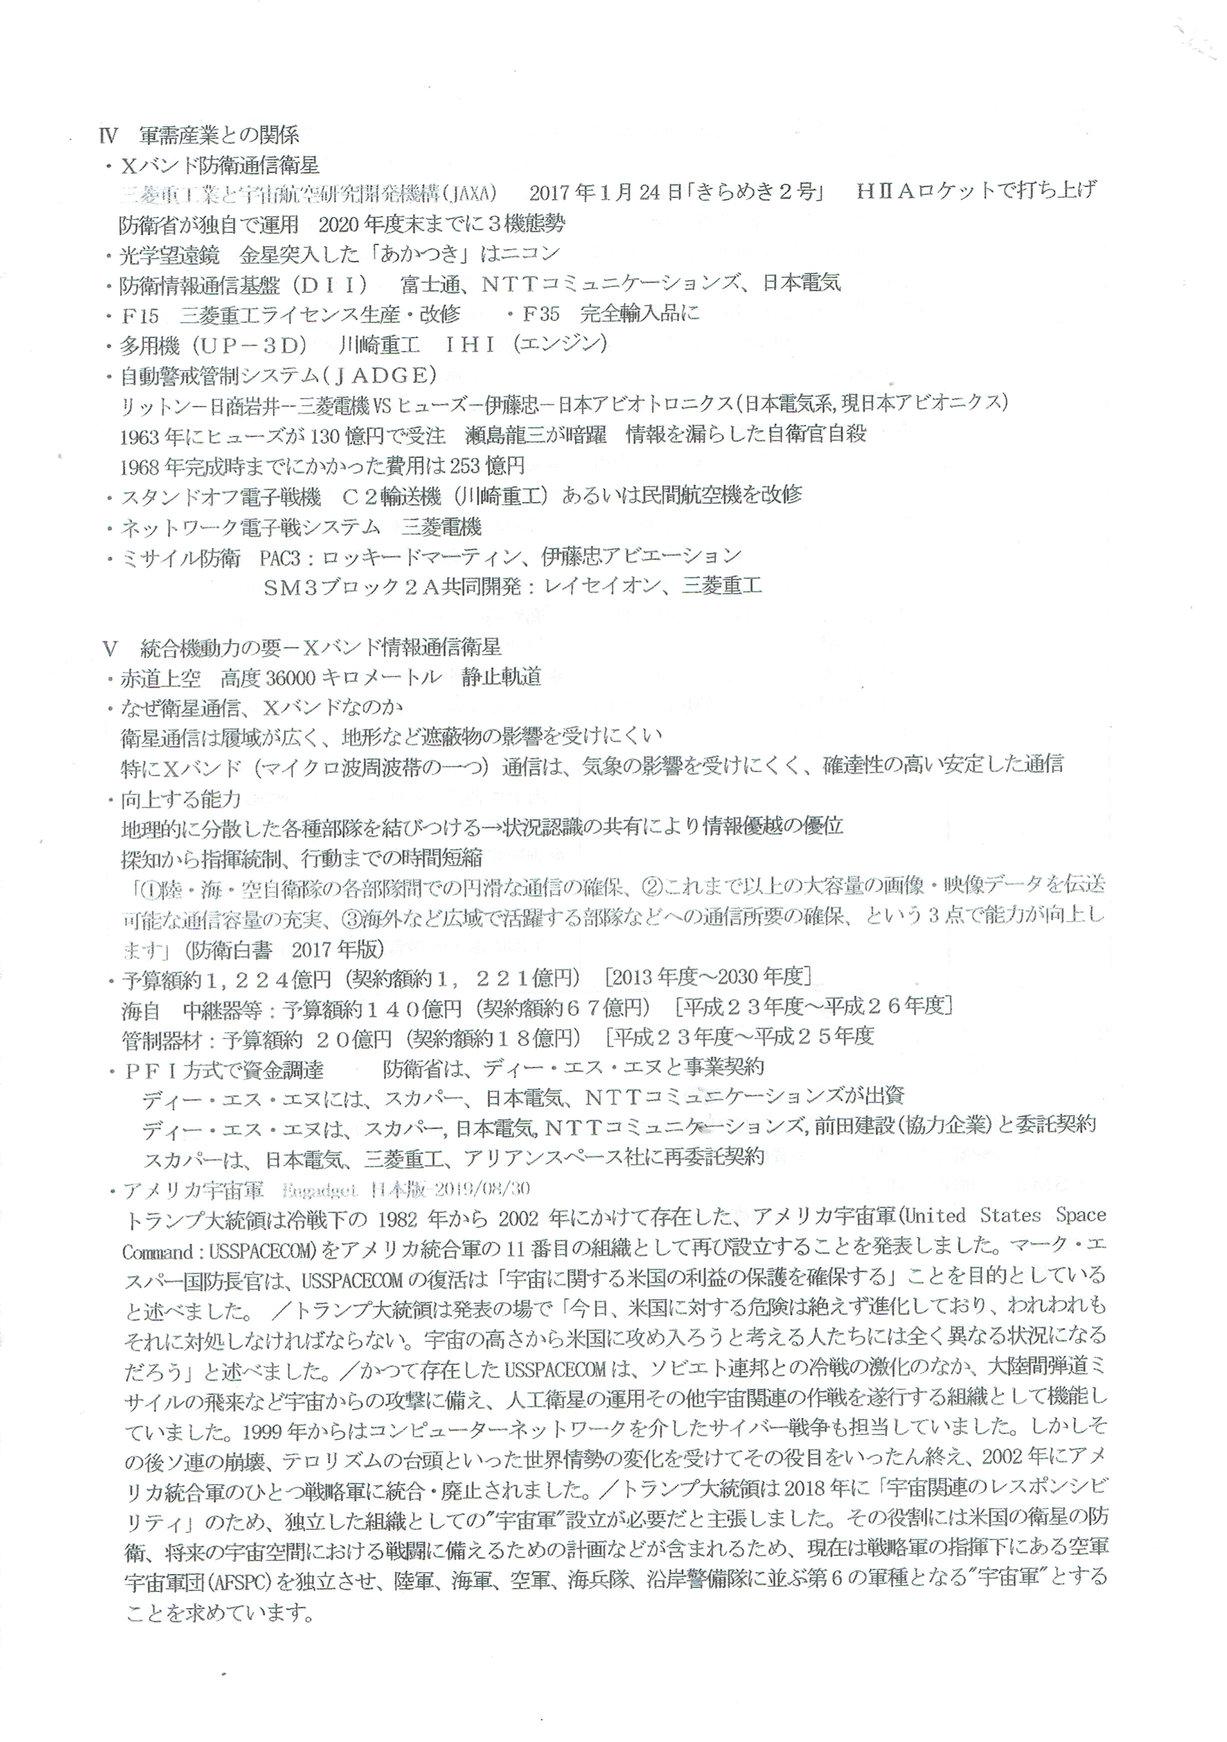 CCF201909180004[1]